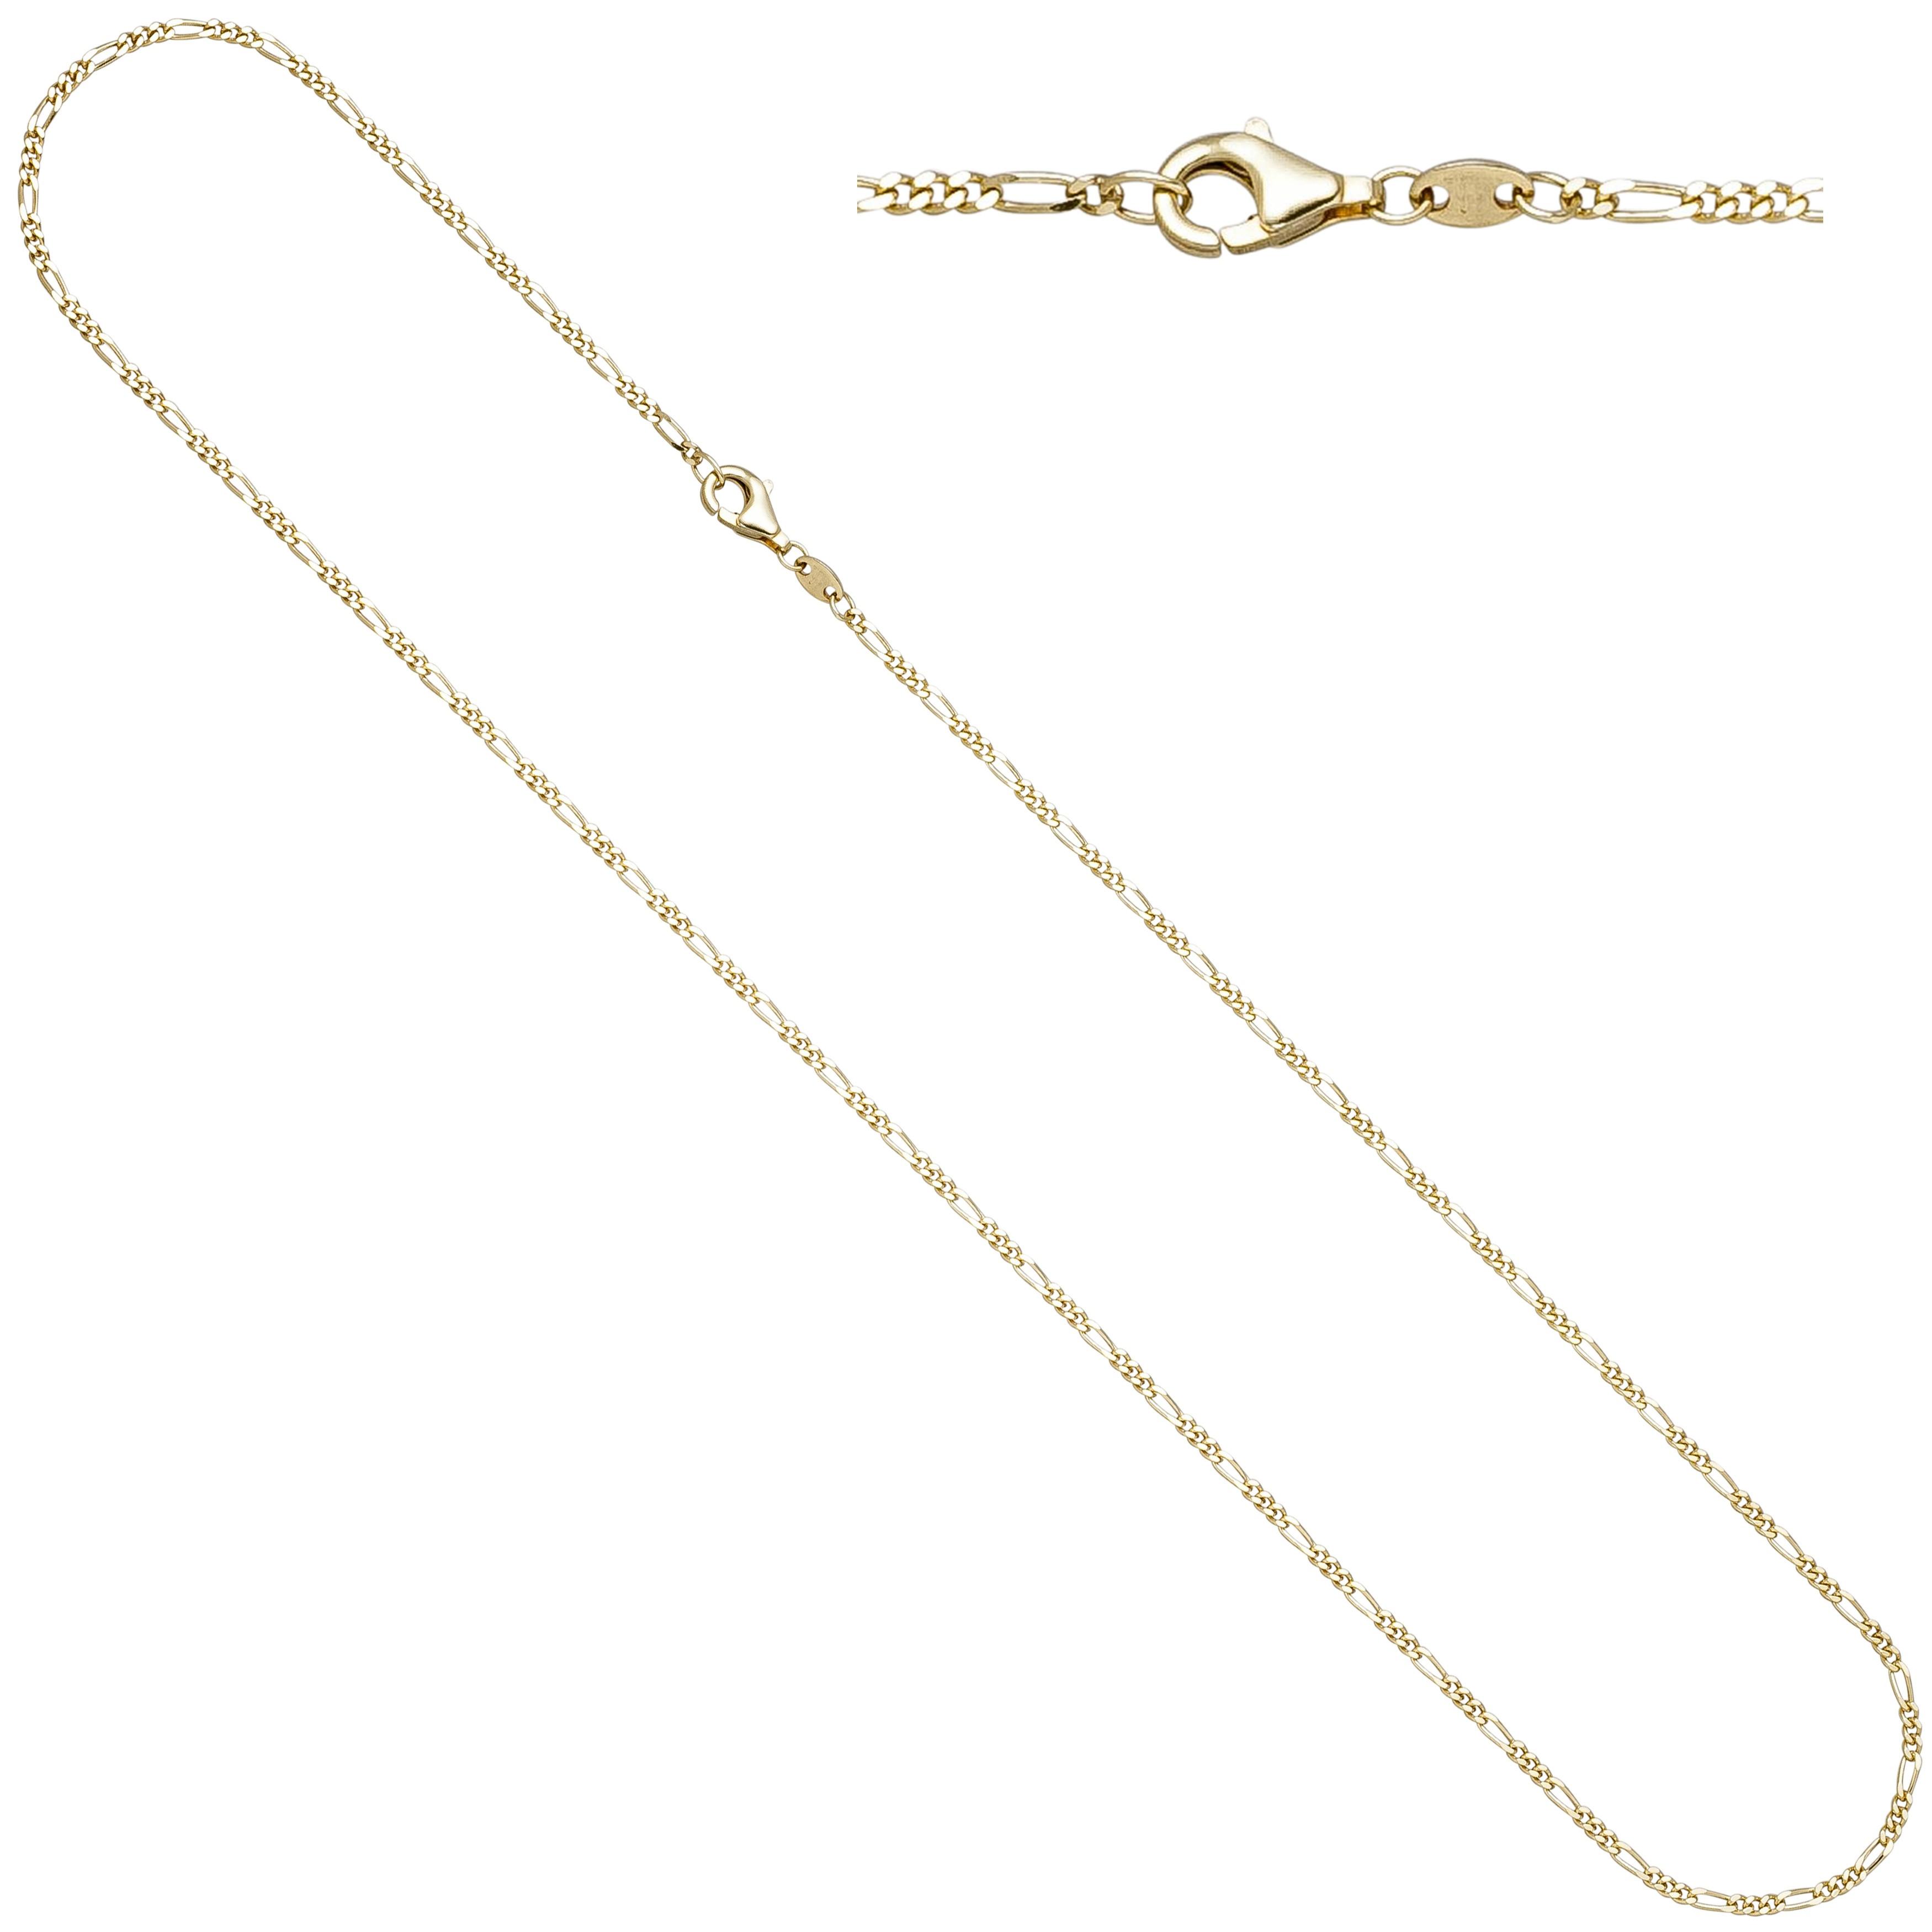 Figarokette 585 Gelbgold diamantiert 1,7mm 45cm